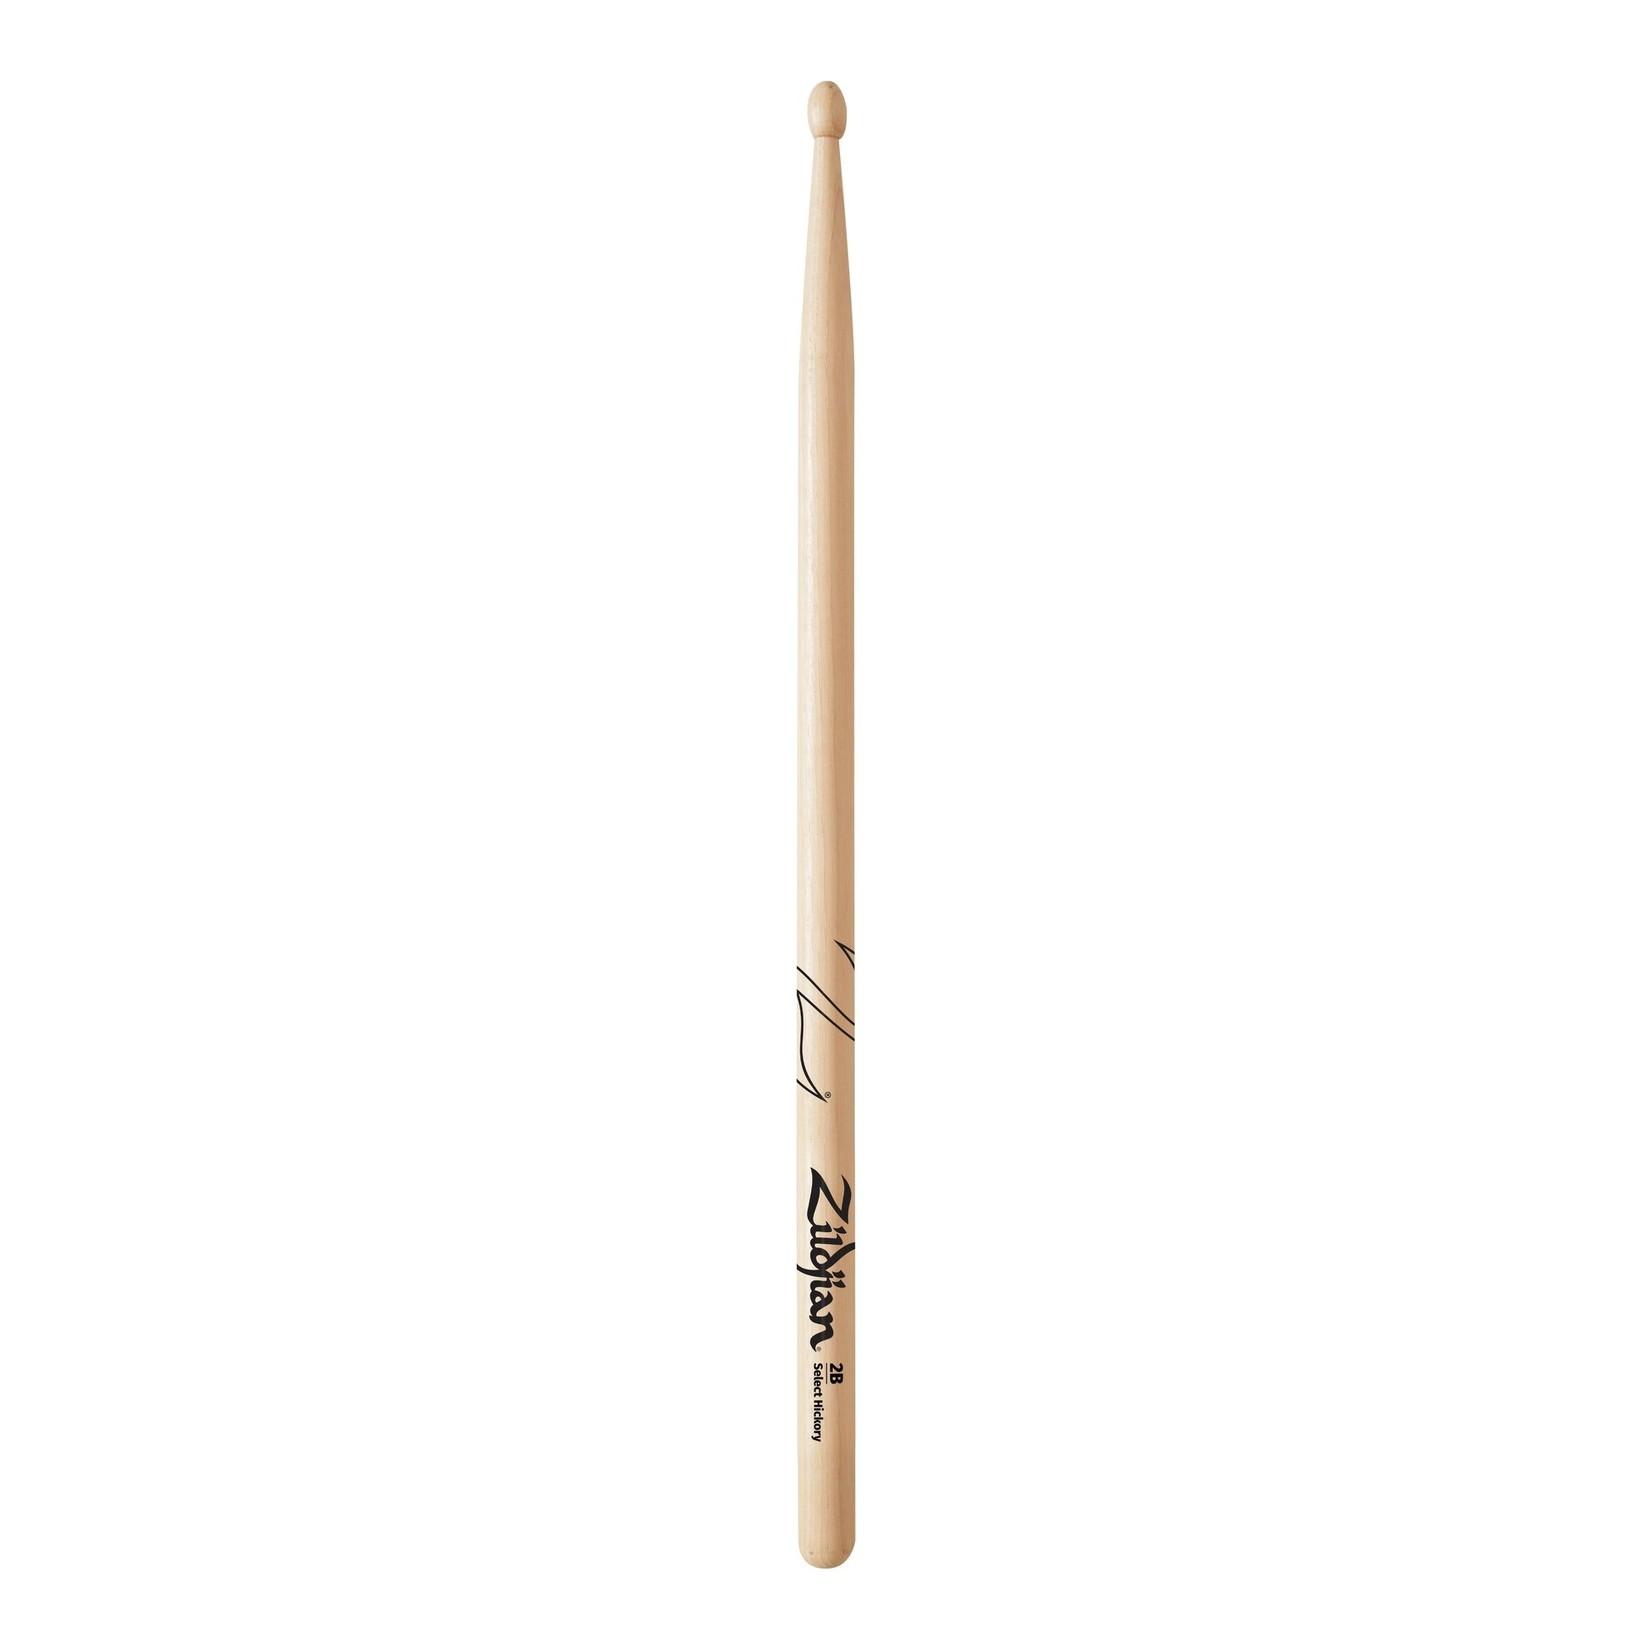 Zildjian Zildjian 2B Drumsticks